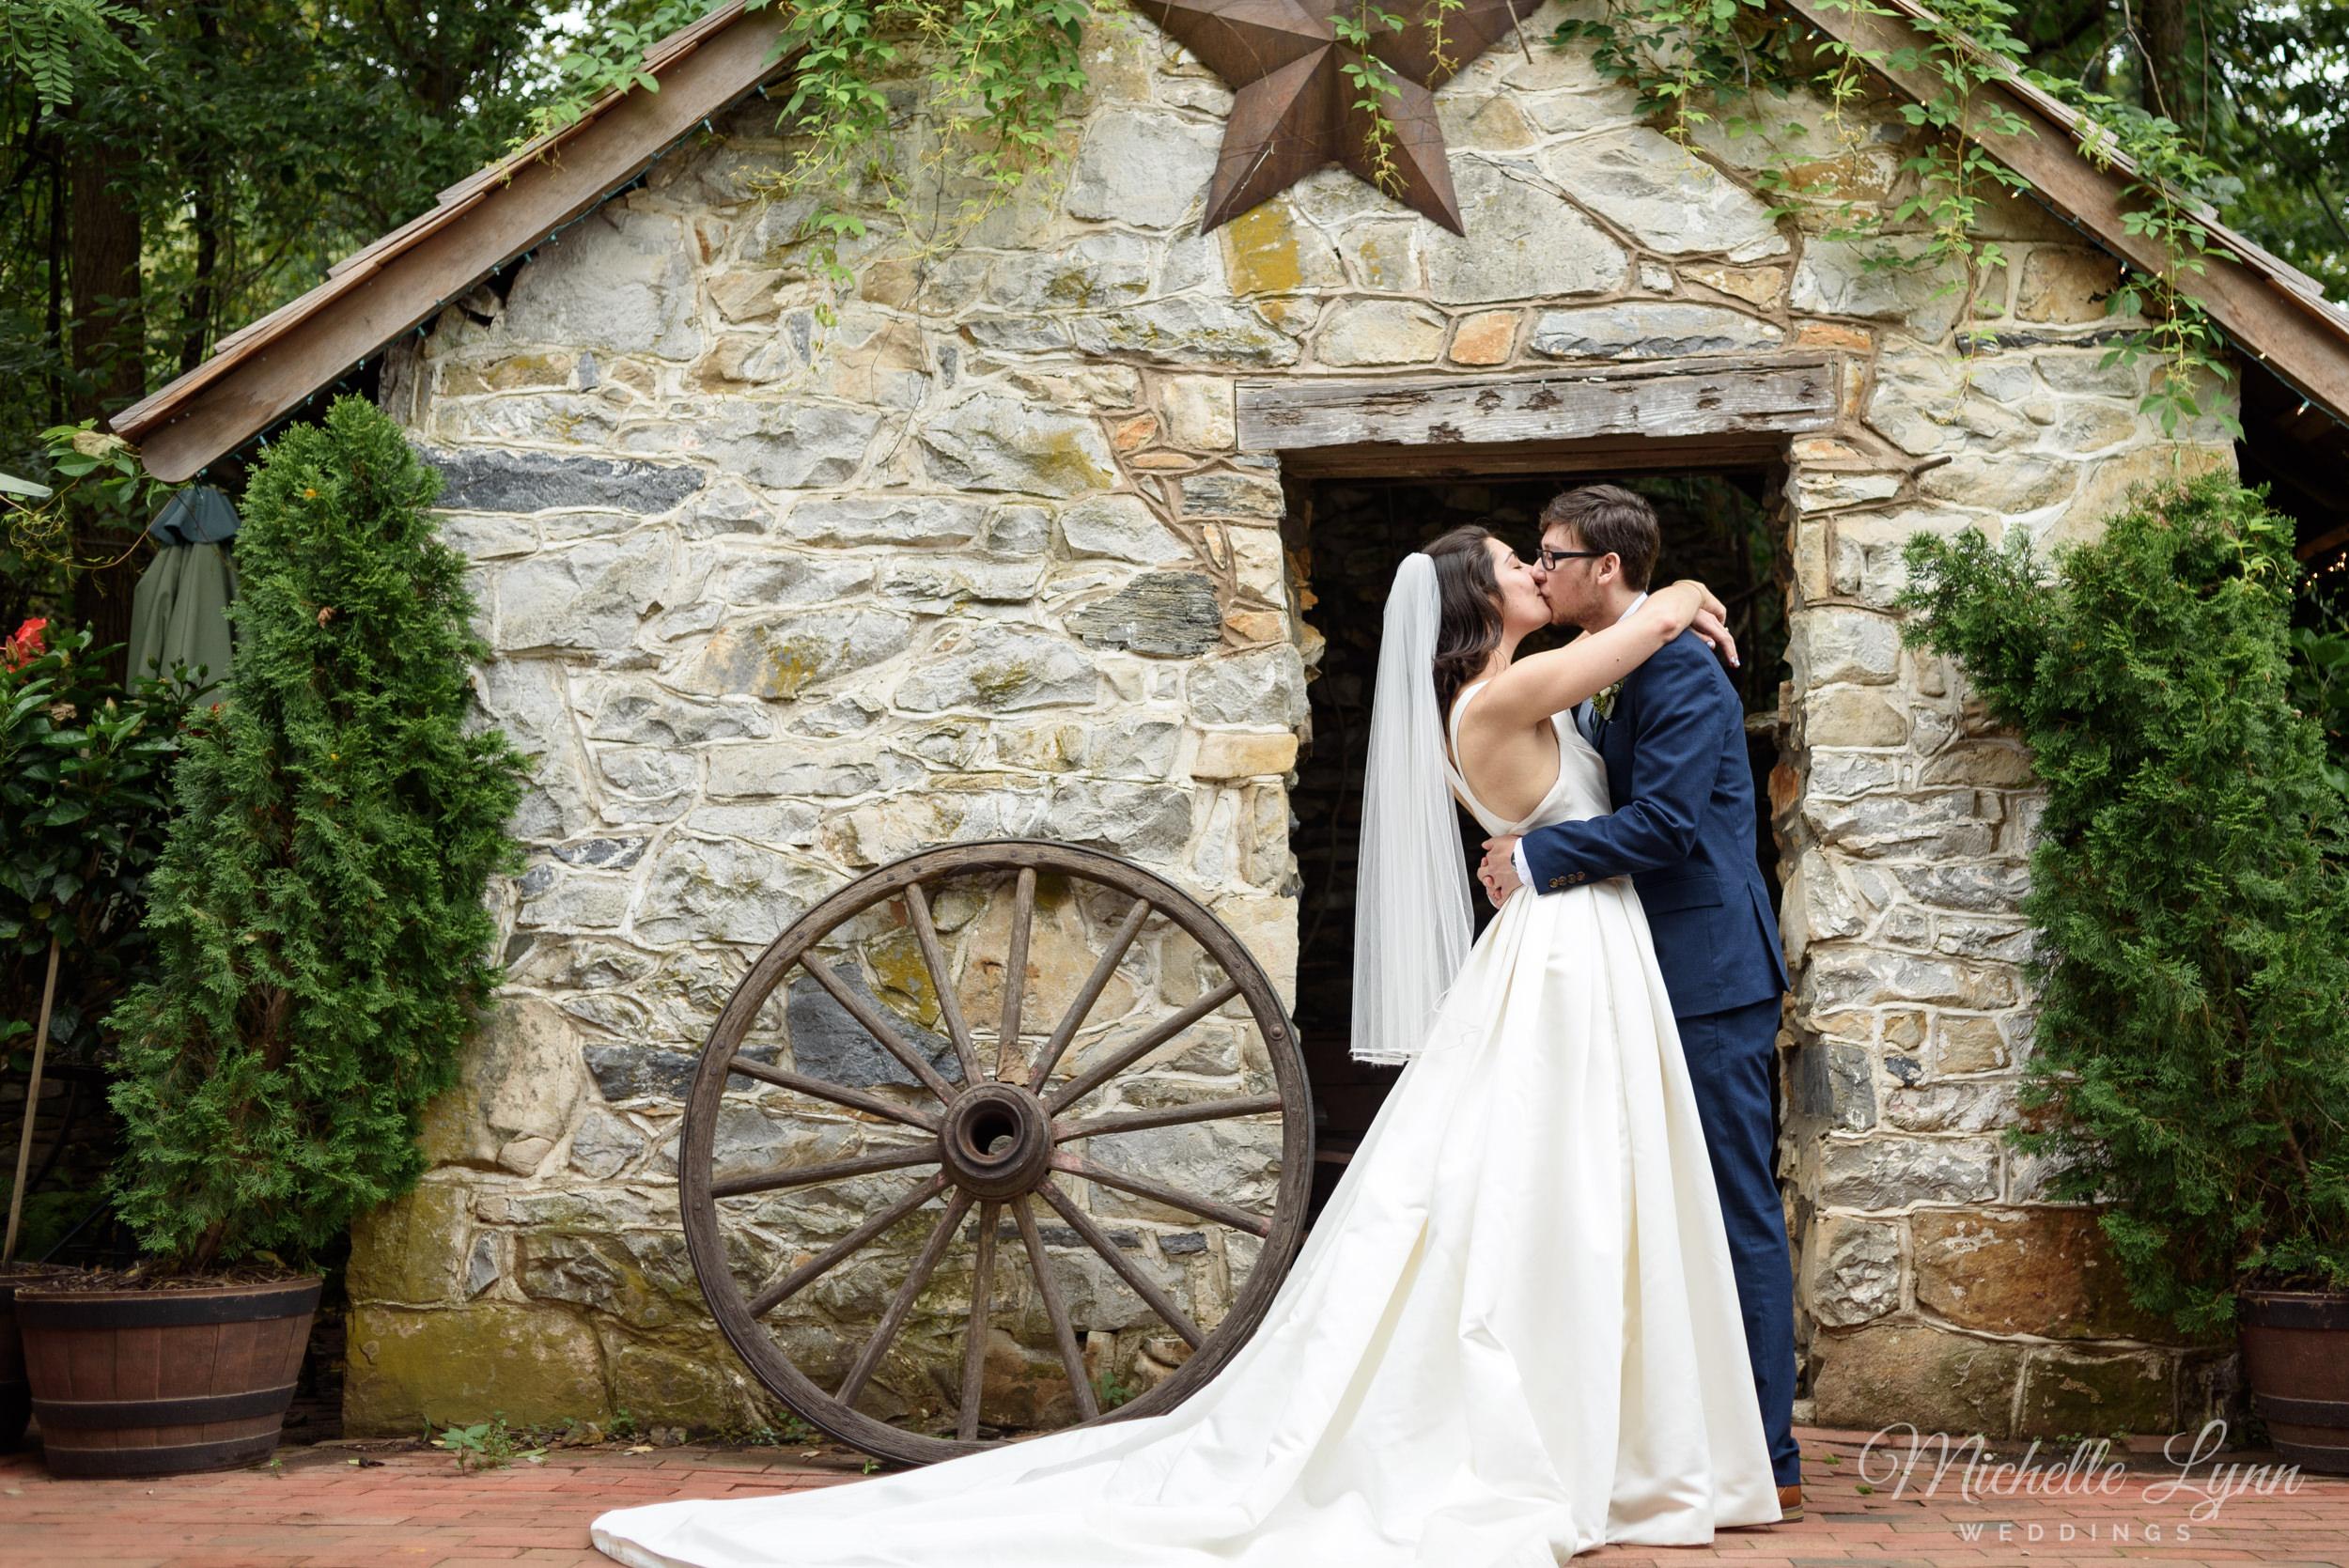 mlw-general-warren-malvern-wedding-photographer-27.jpg